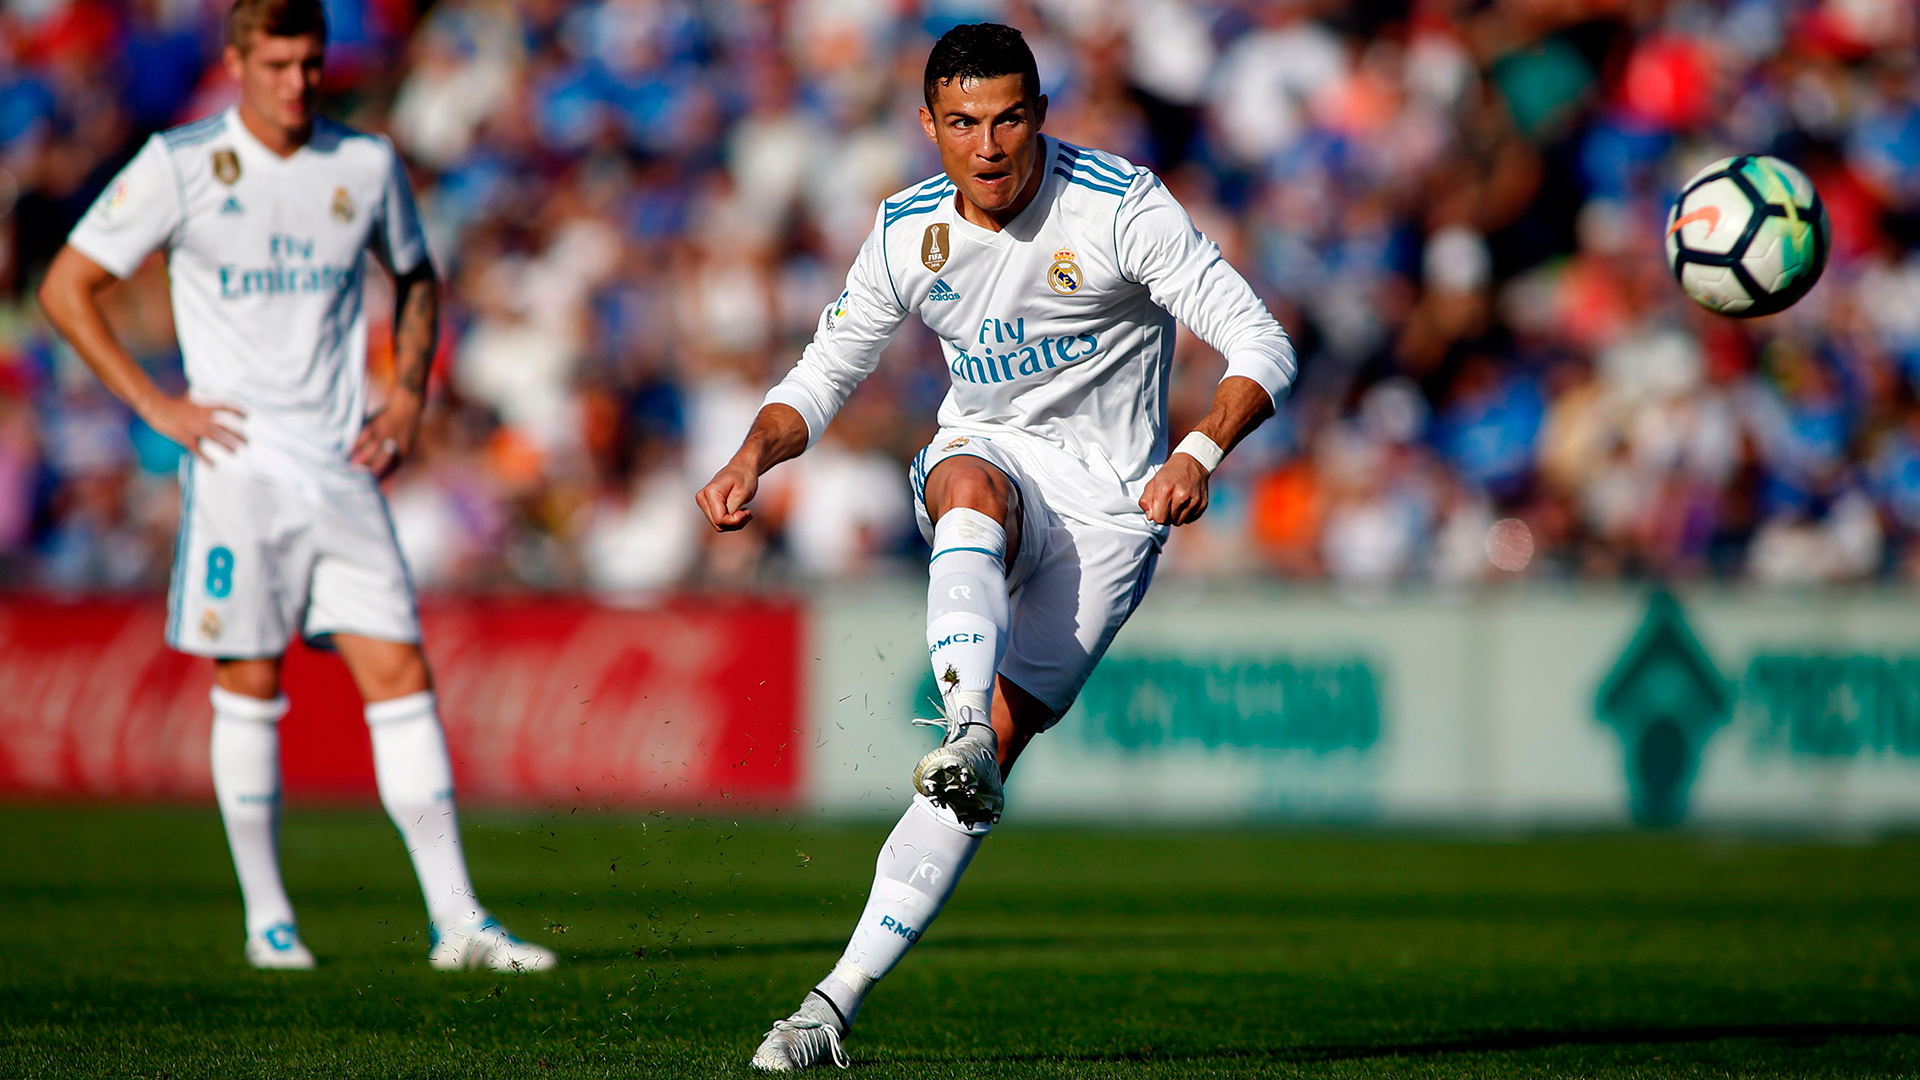 Cristiano Ronaldo goals Real Madrid star scores first Liga goal